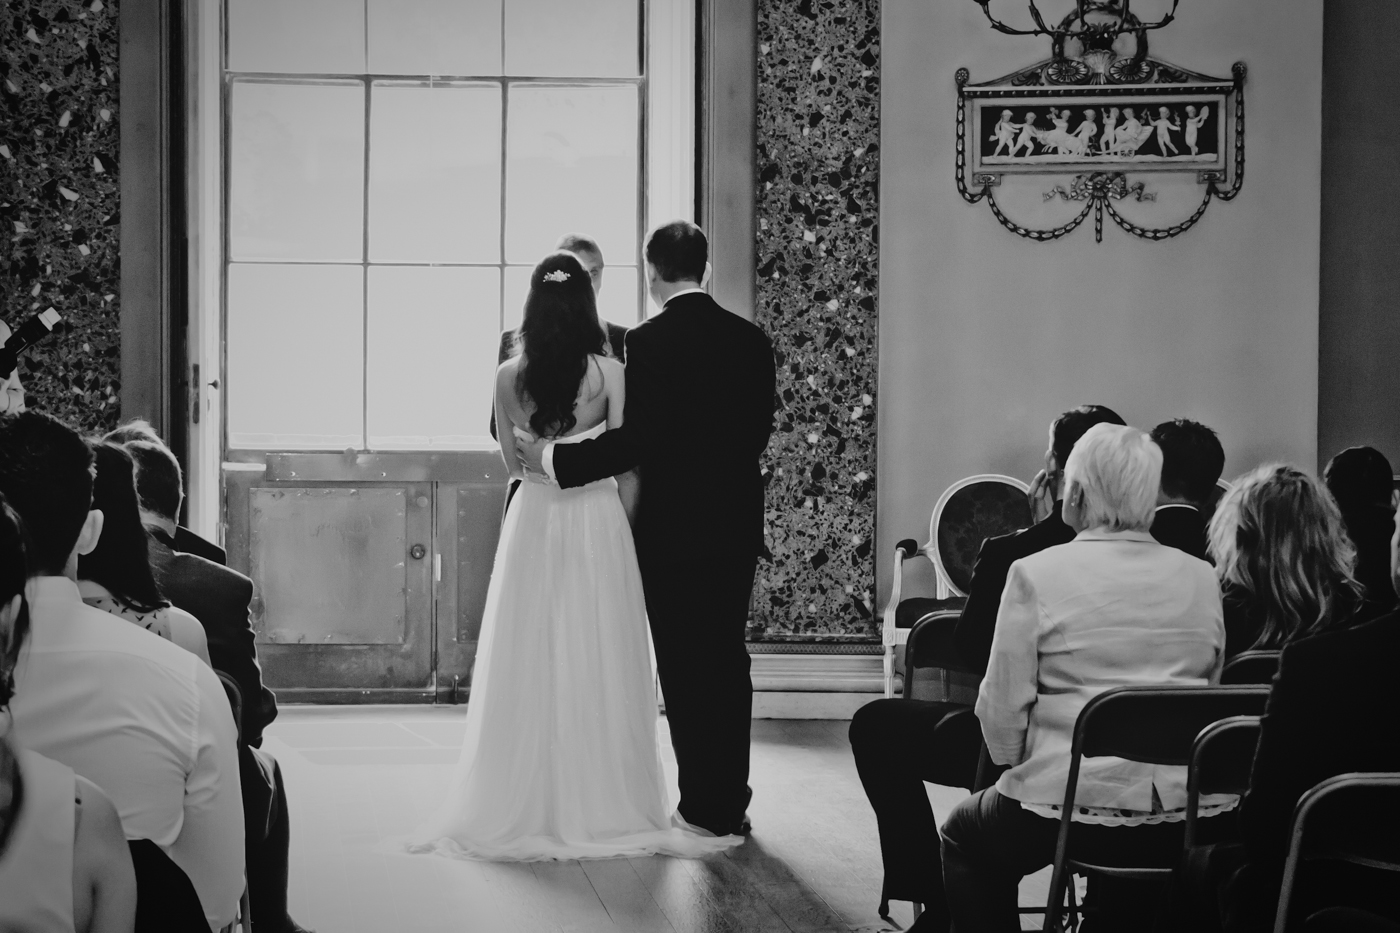 054 - Abi and Chris at Kedleston Hall - Wedding Photography by Mark Pugh www.markpugh.com - 5336.JPG